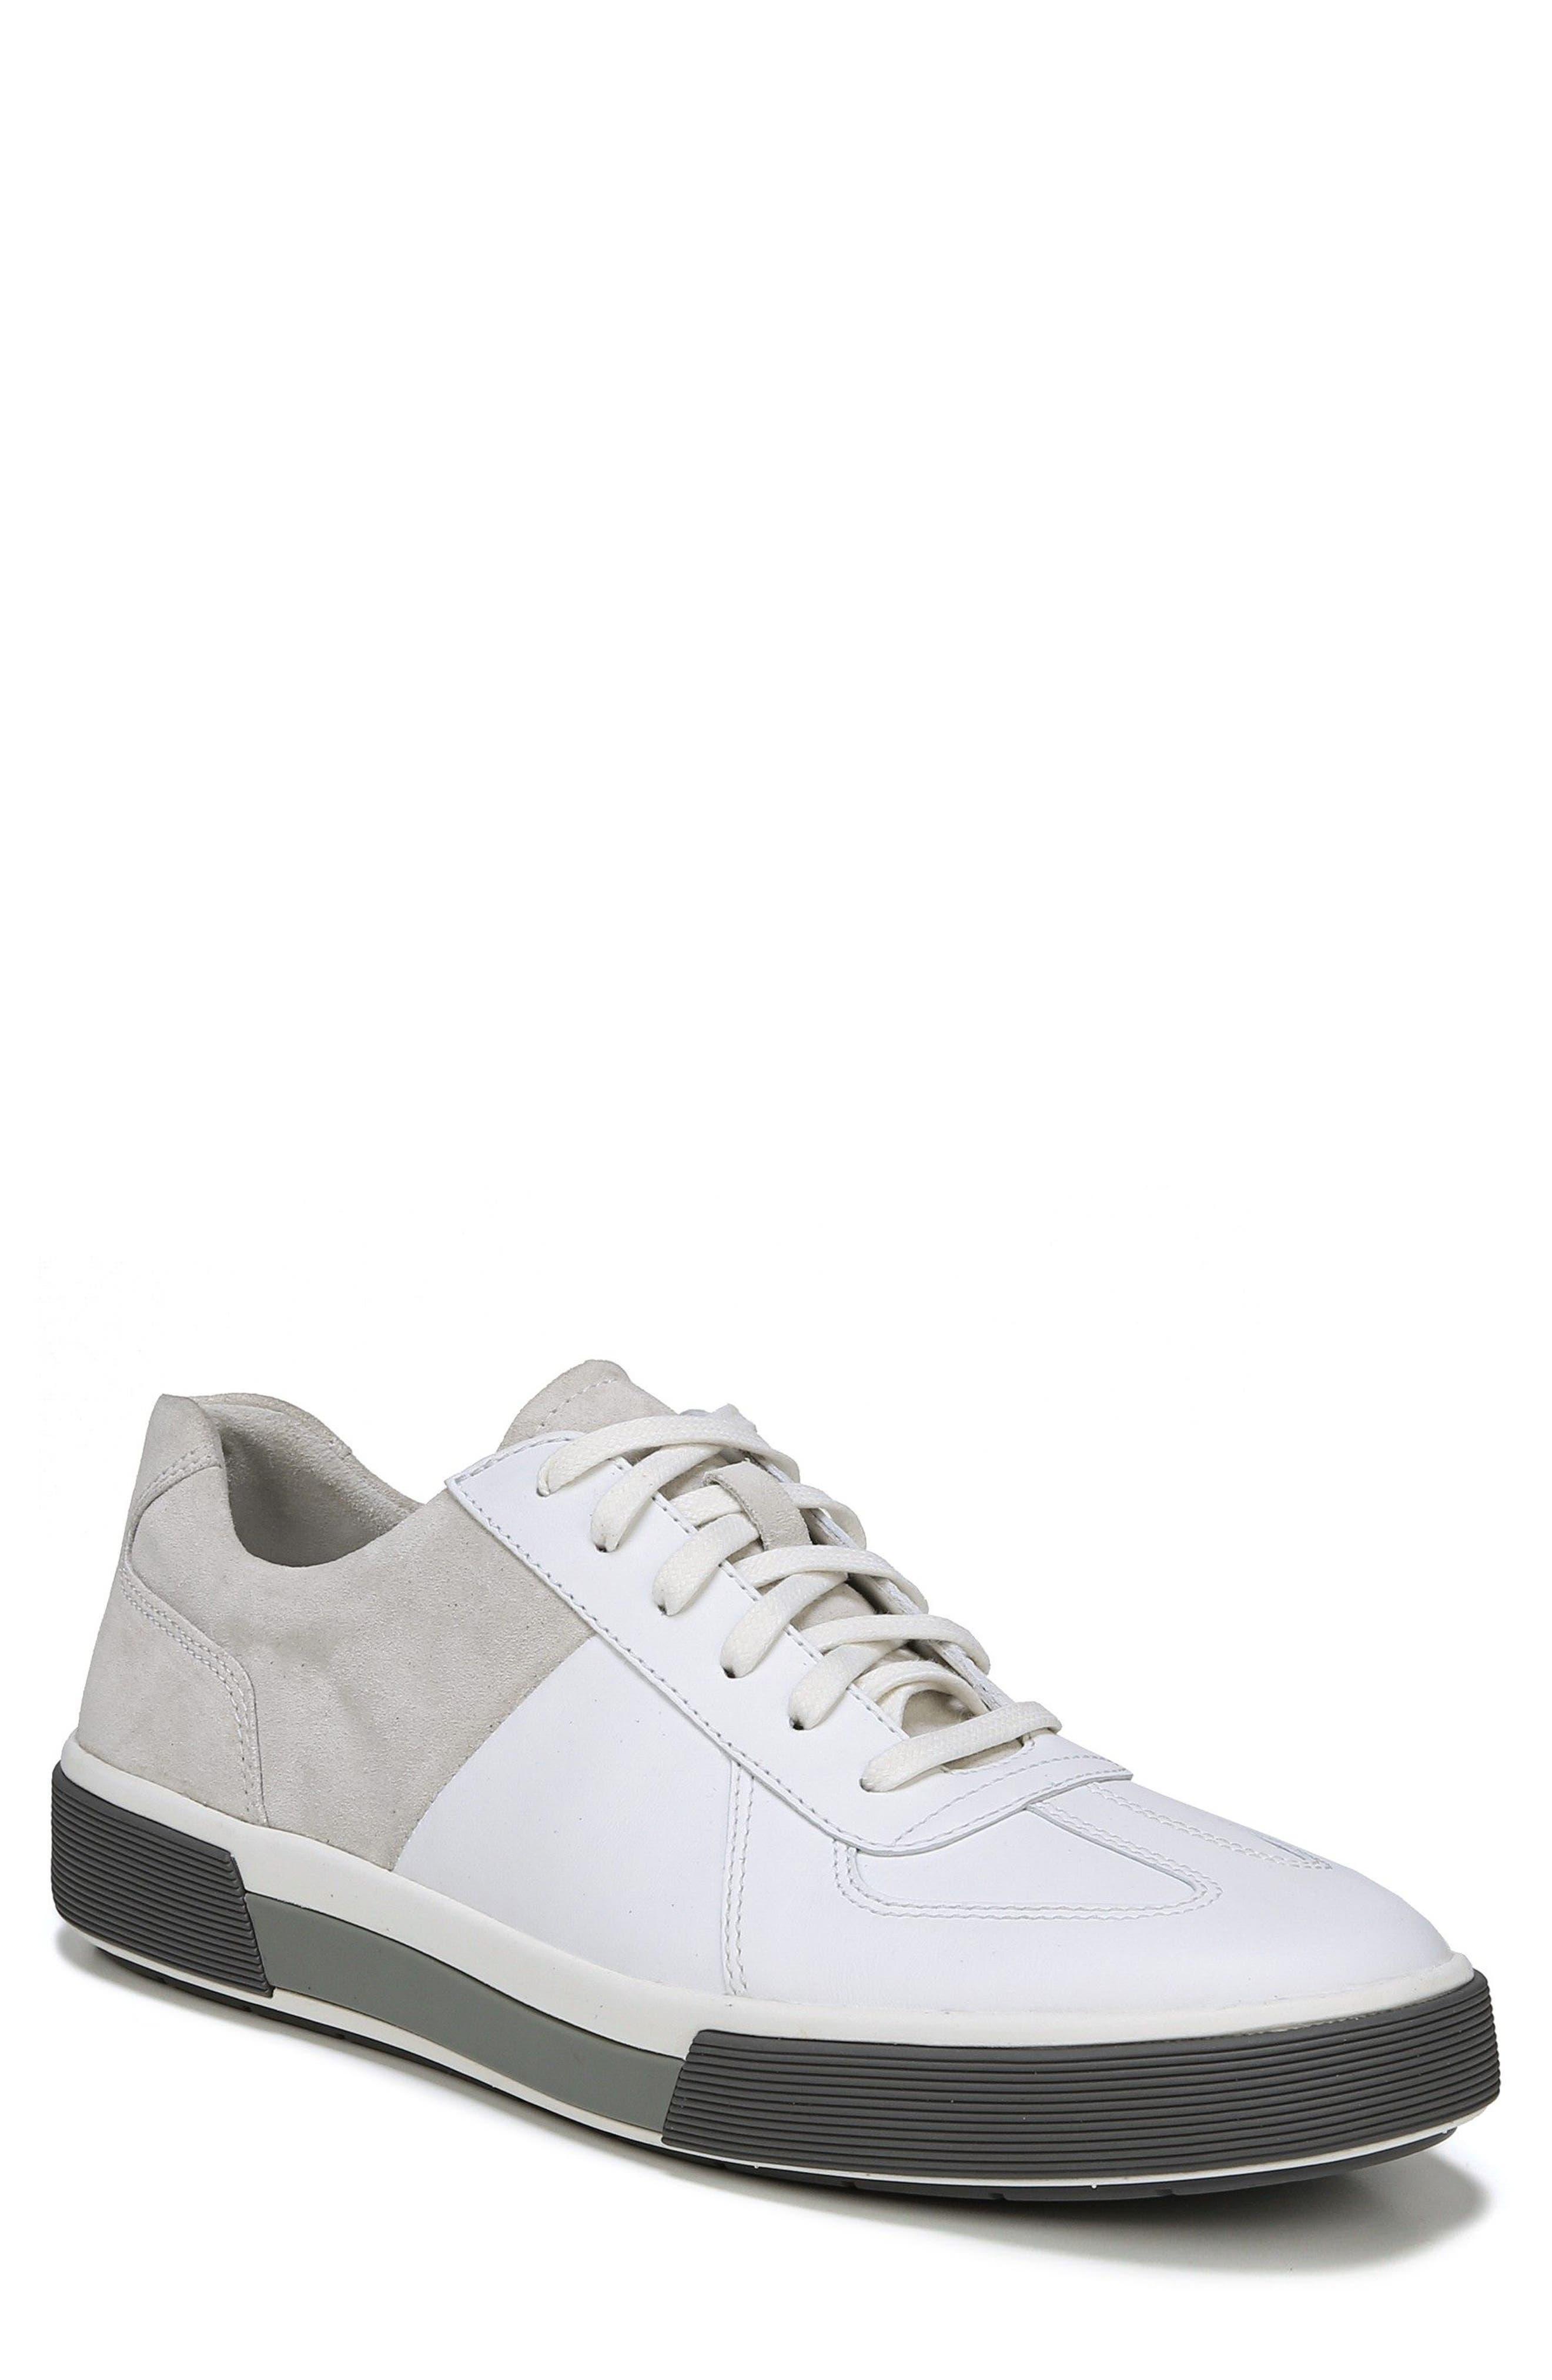 VINCE Rogue Low Top Sneaker, Main, color, WHITE/ HORCHATA